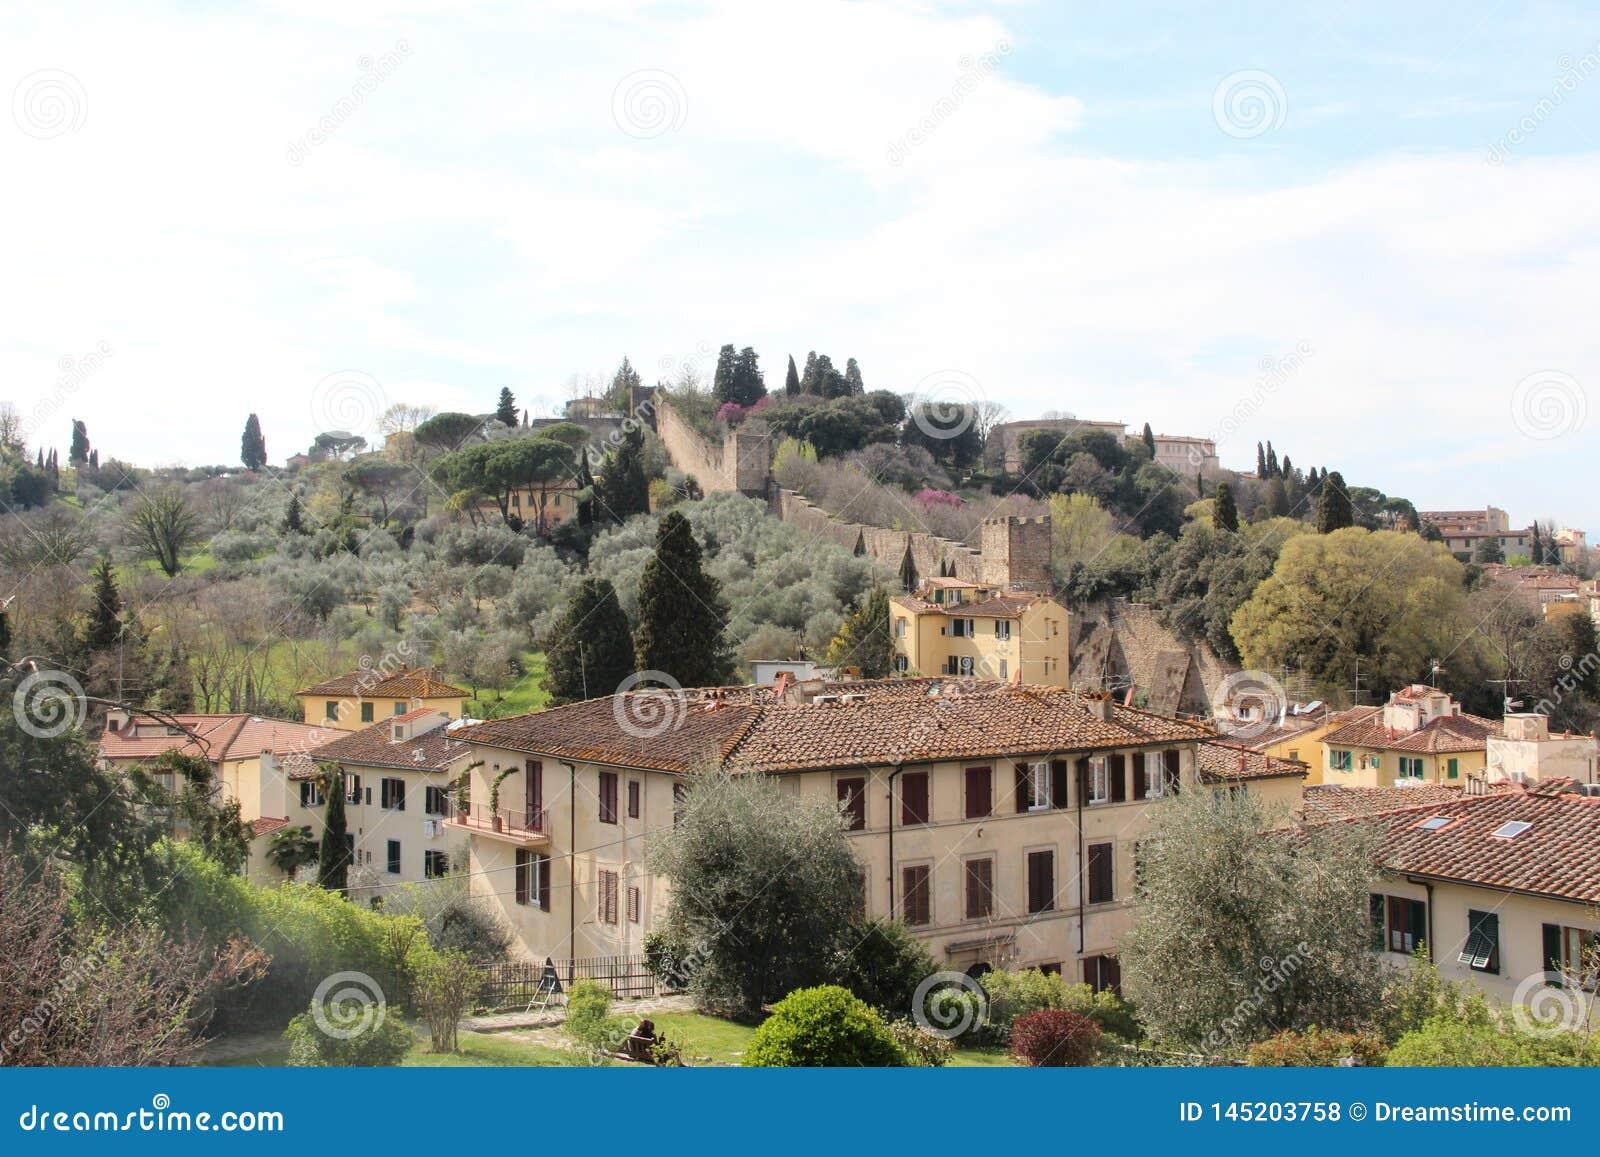 Самое красивое место, весна 2019 Флоренс, живописные места, ландшафт, природа